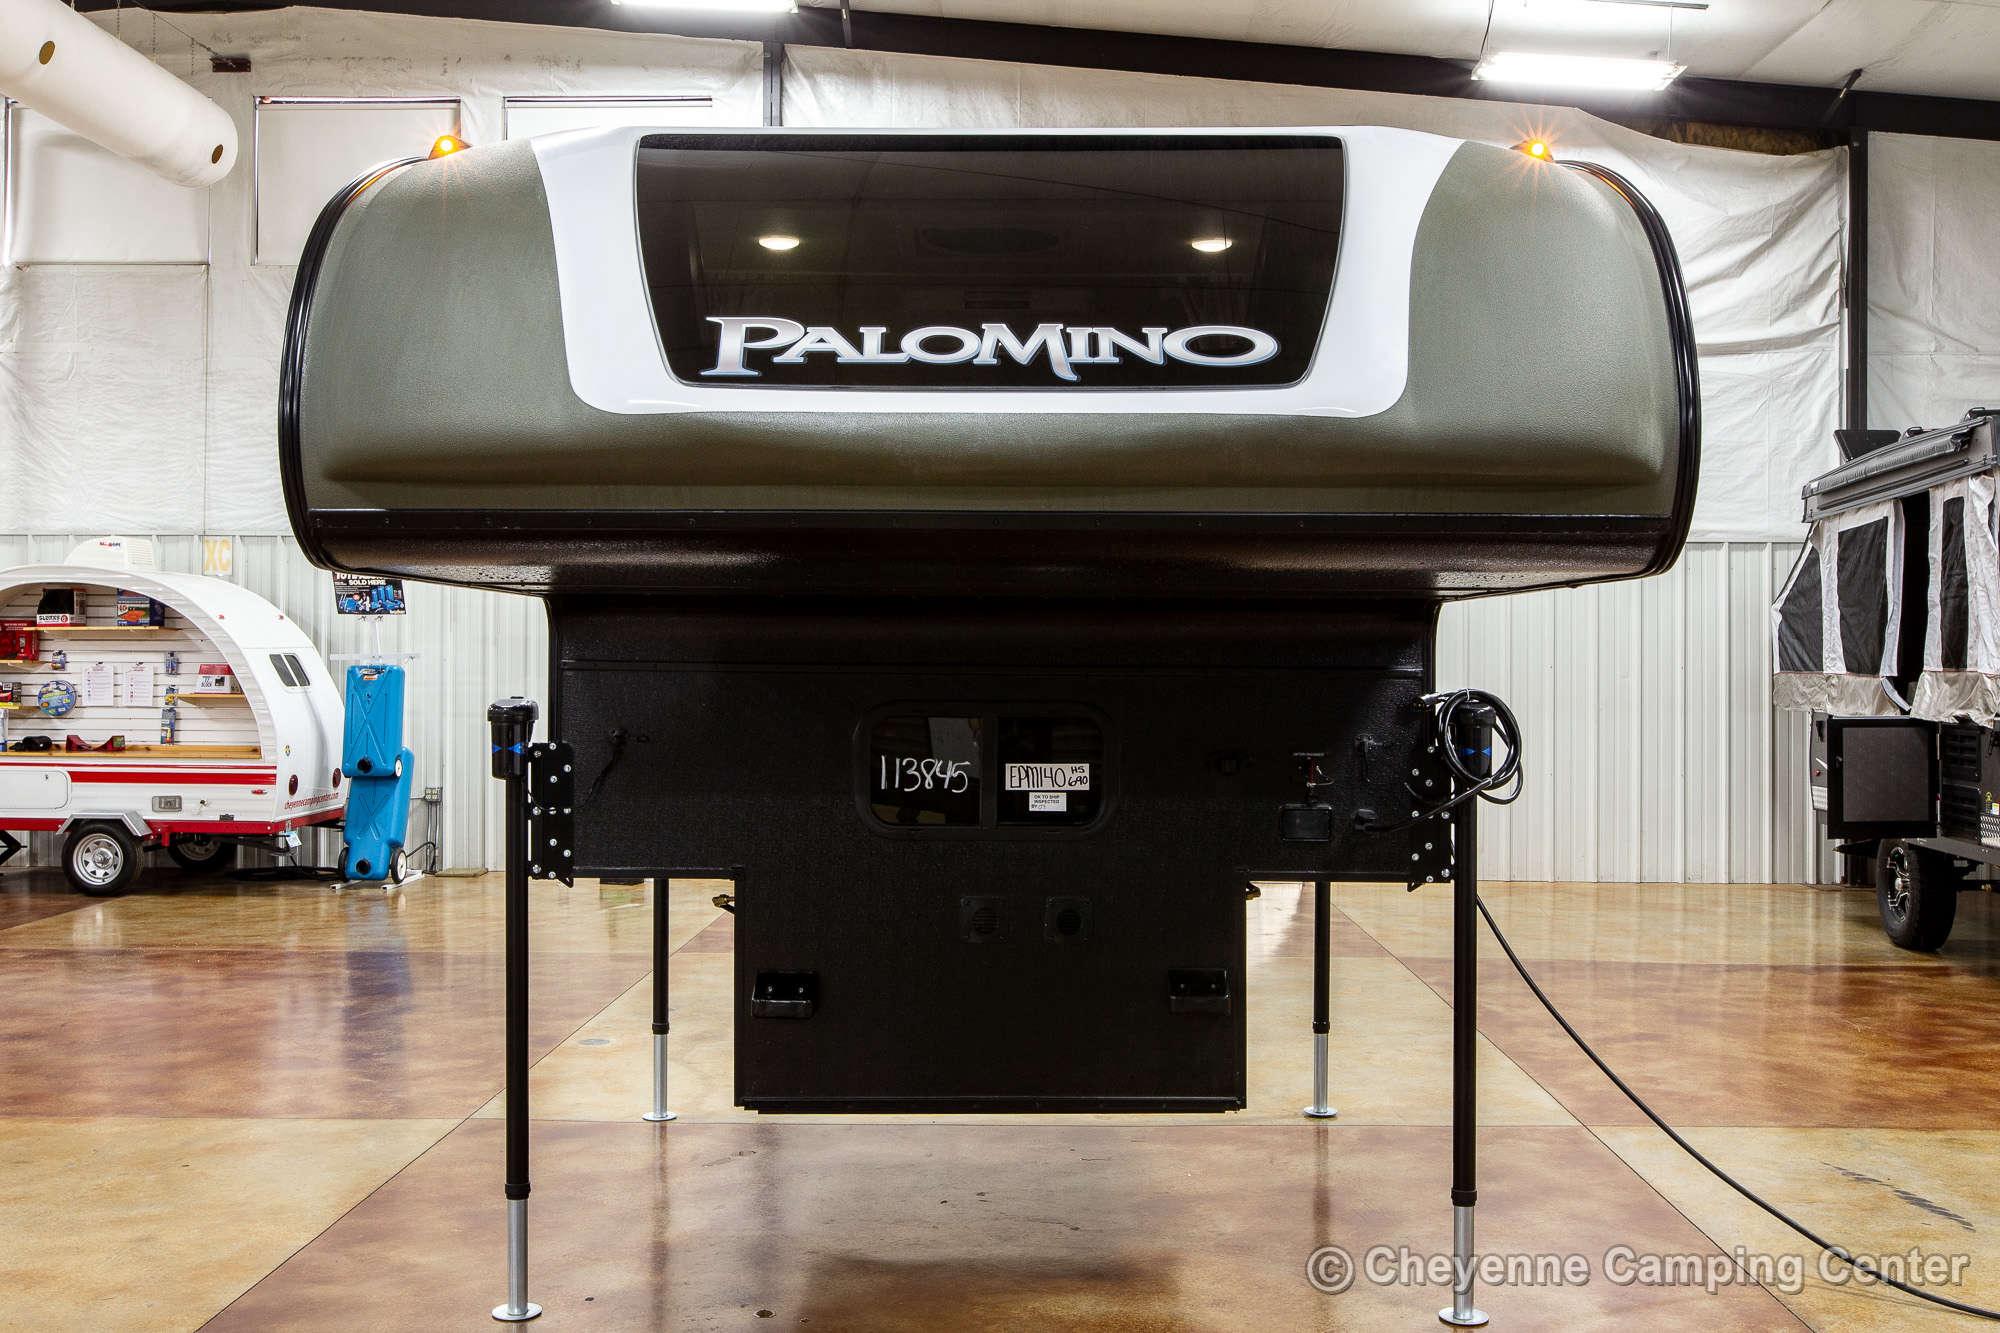 2021 Palomino BackPack HS-690 Truck Camper Exterior Image